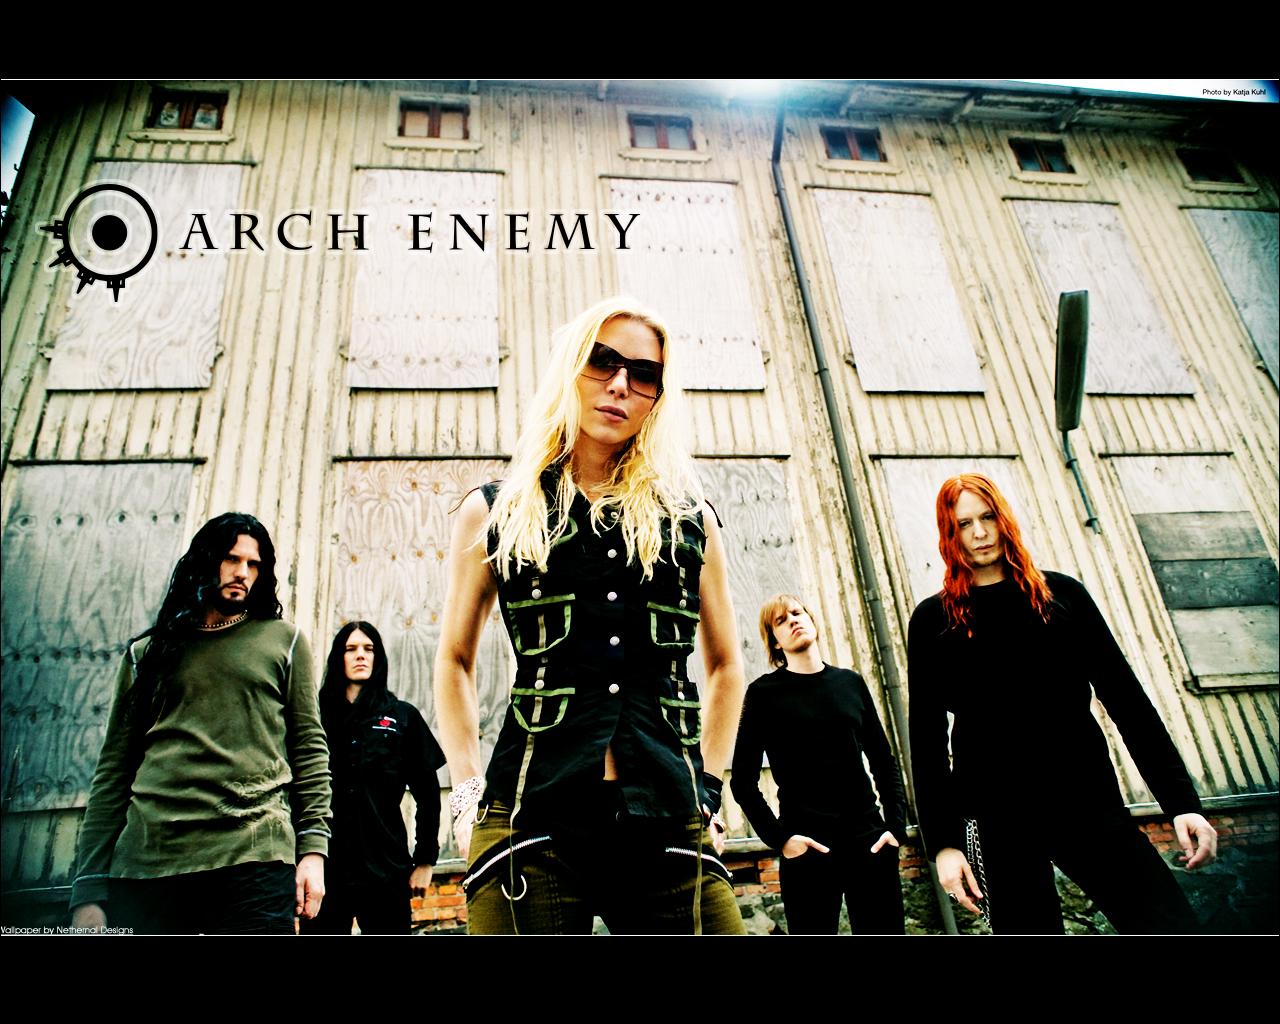 http://2.bp.blogspot.com/-MlW252vMhN8/Tb60HflAt0I/AAAAAAAAAFM/mcsF_pW12zk/s1600/Arch+Enemy+wallpaper+%25289%2529.jpg